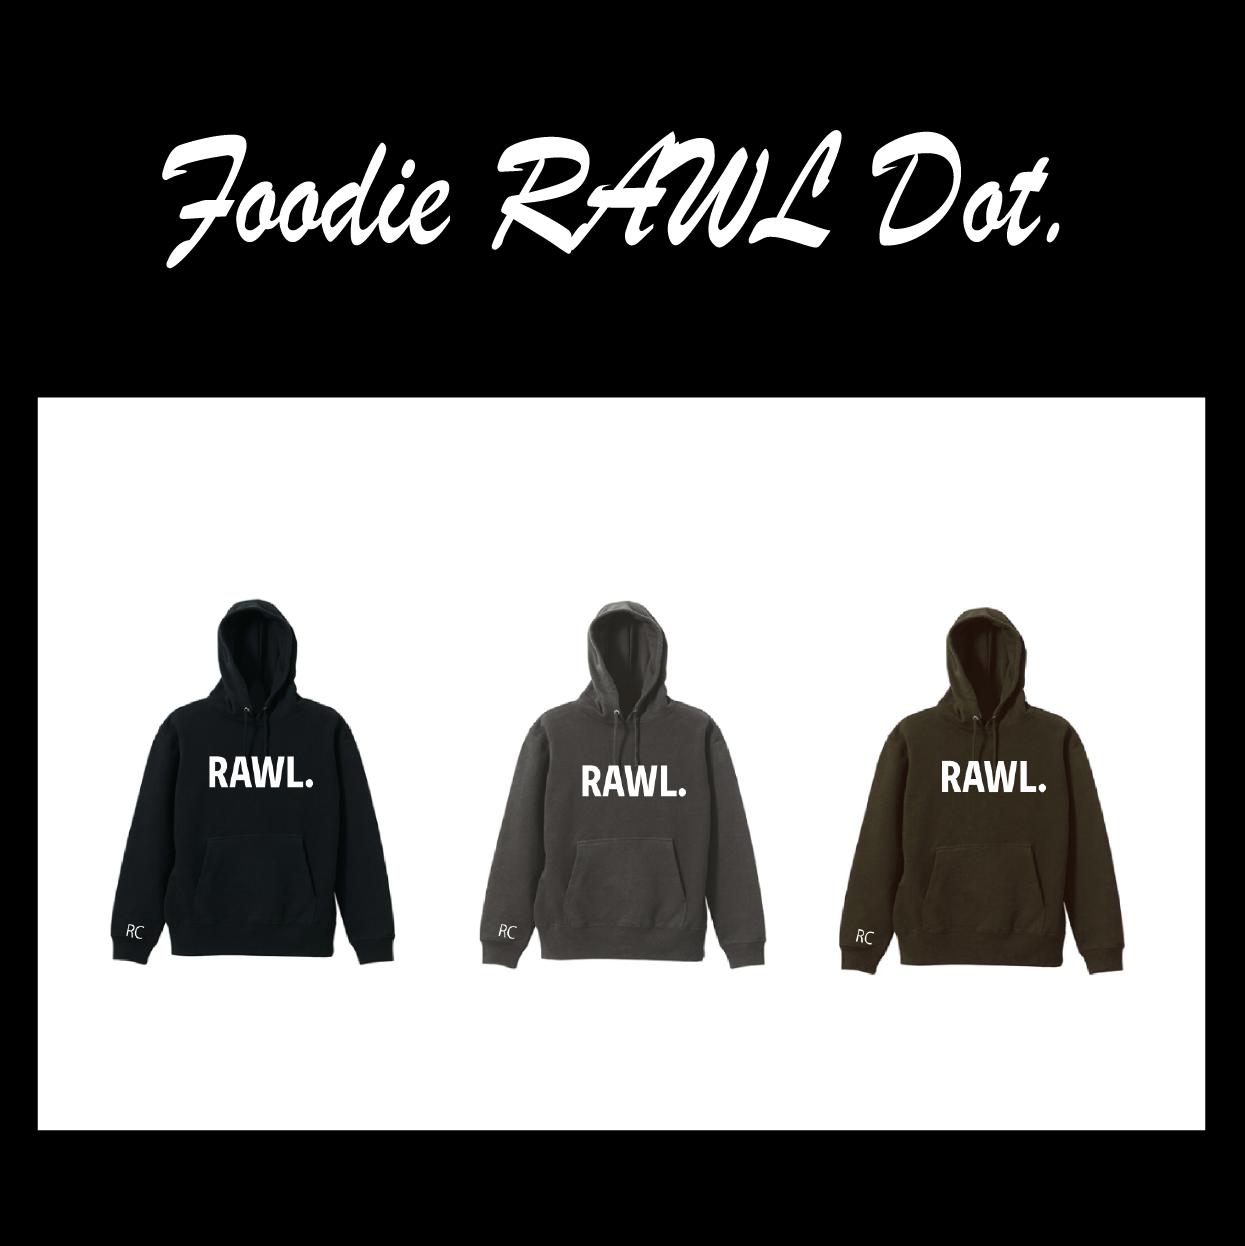 Hoodie RAWL Dot.